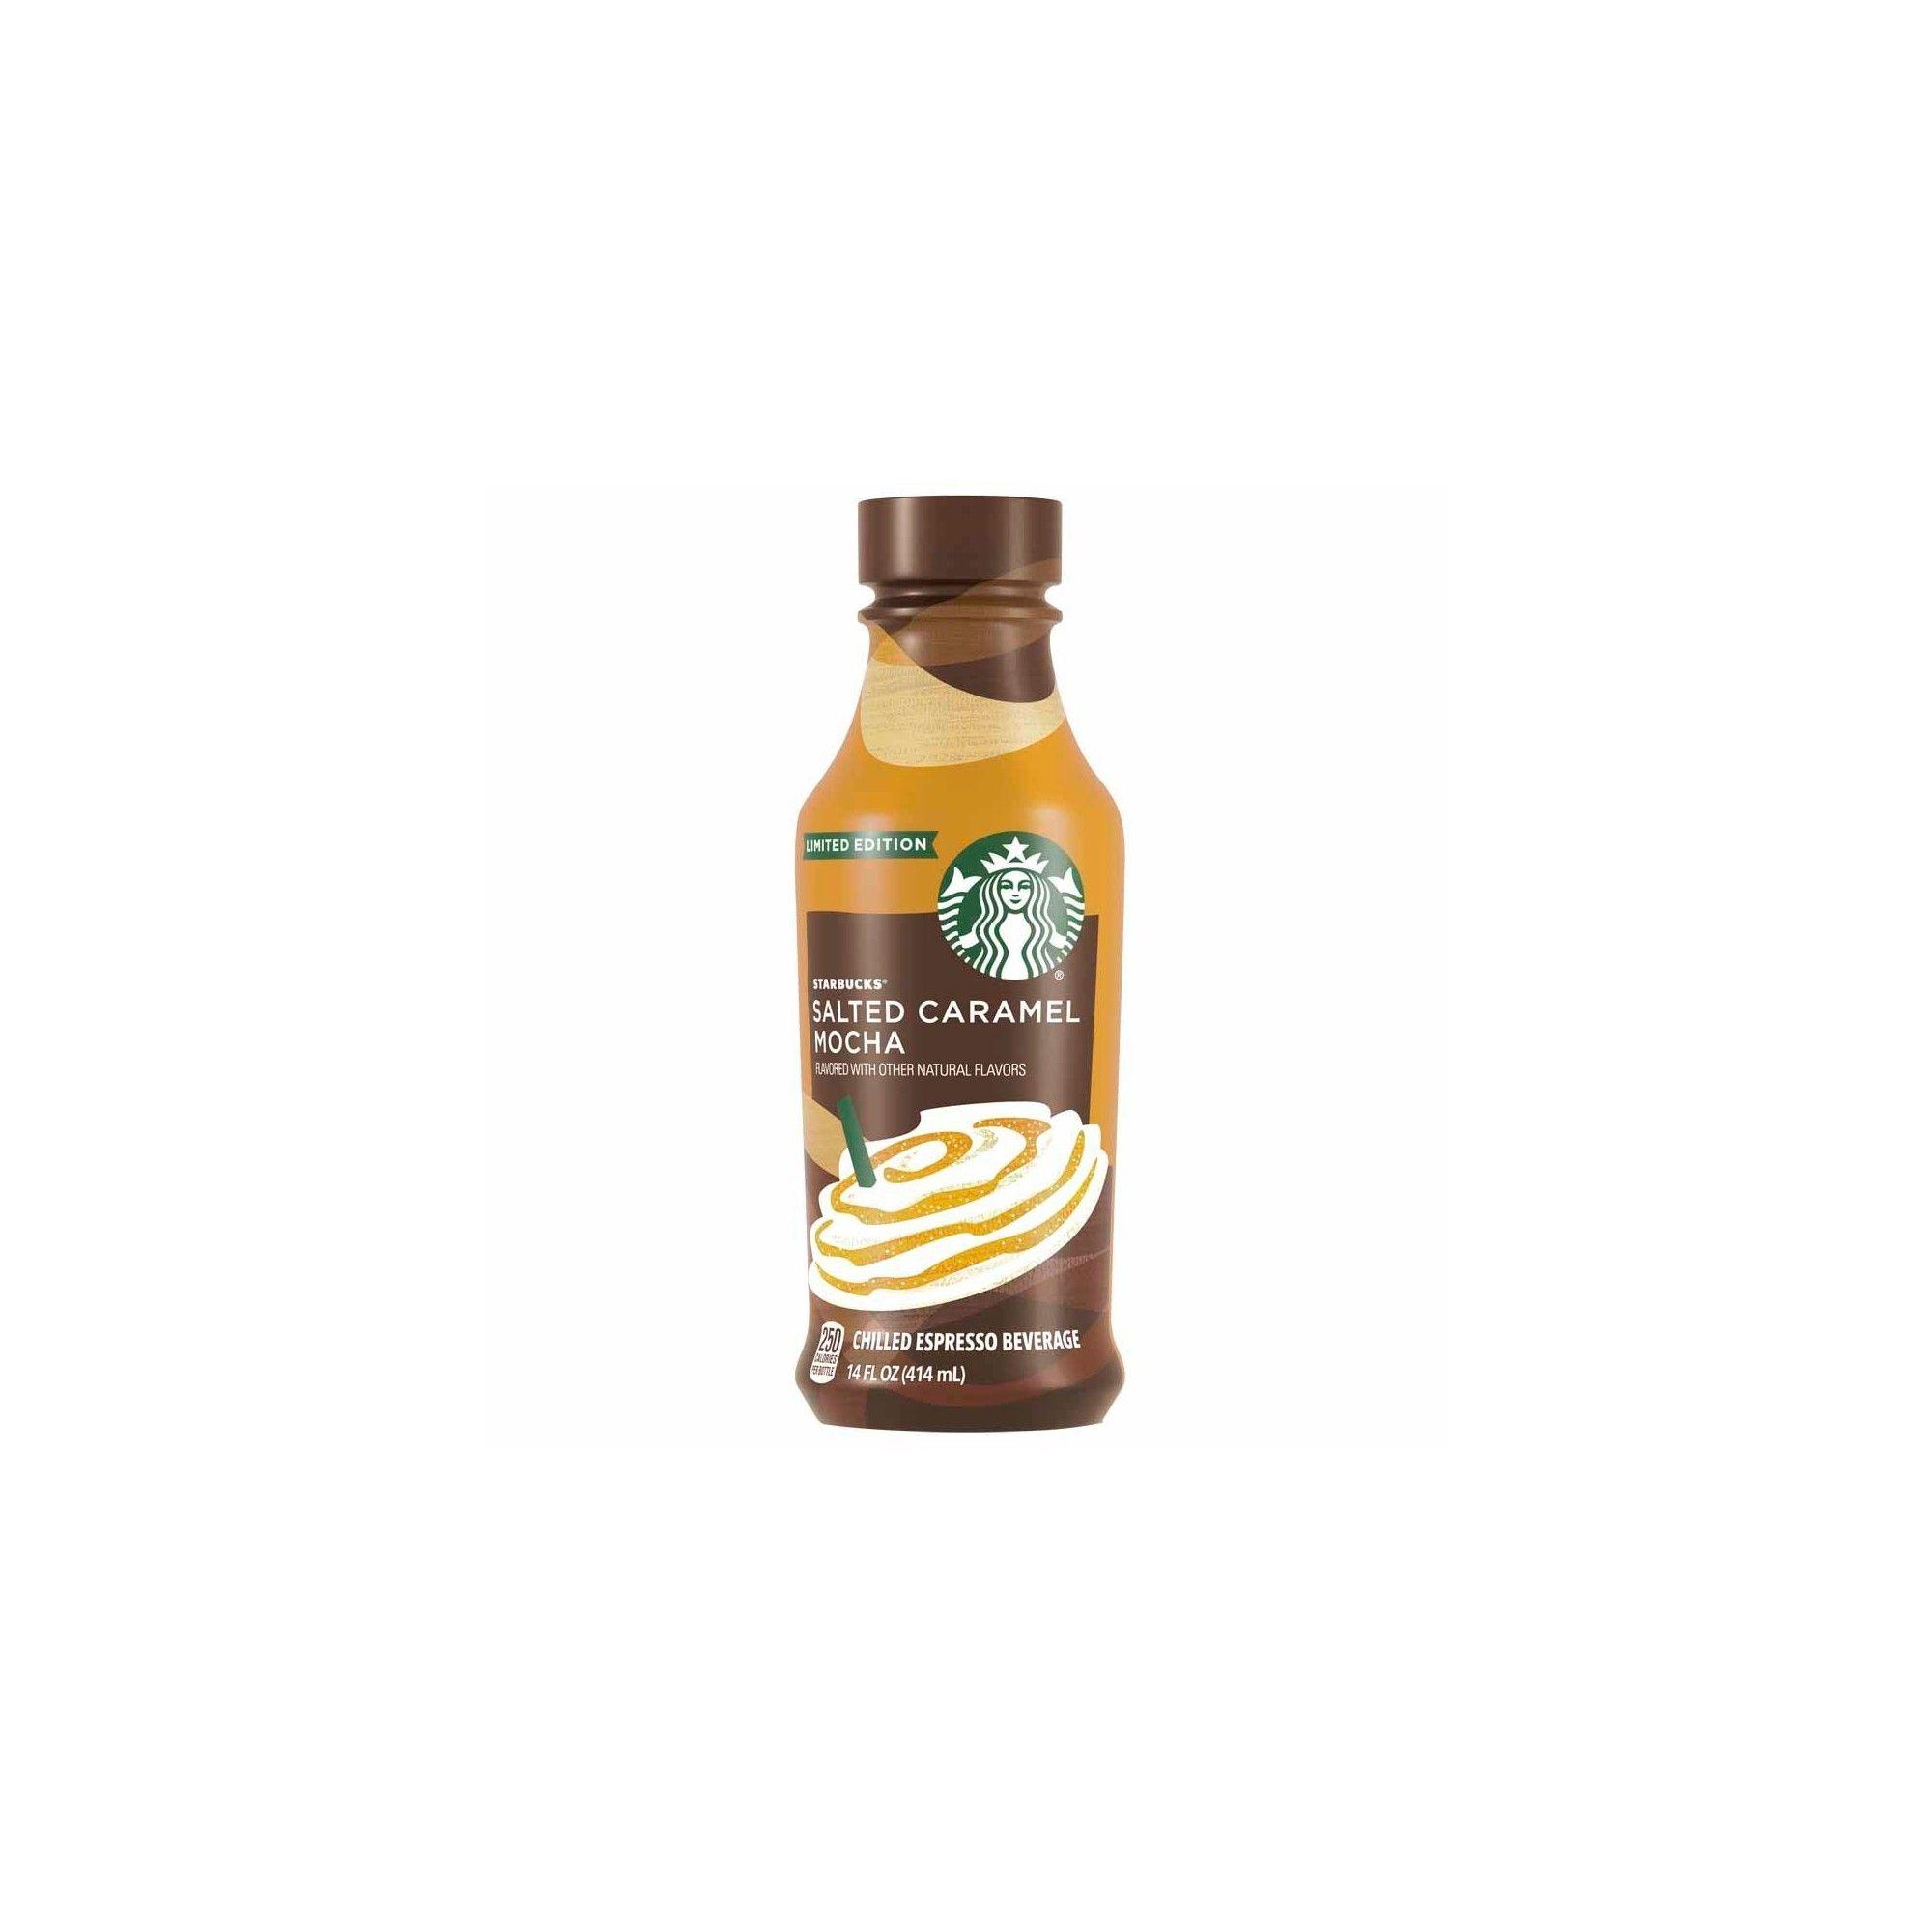 Starbucks Iced Latte Salted Caramel Mocha Limited Time